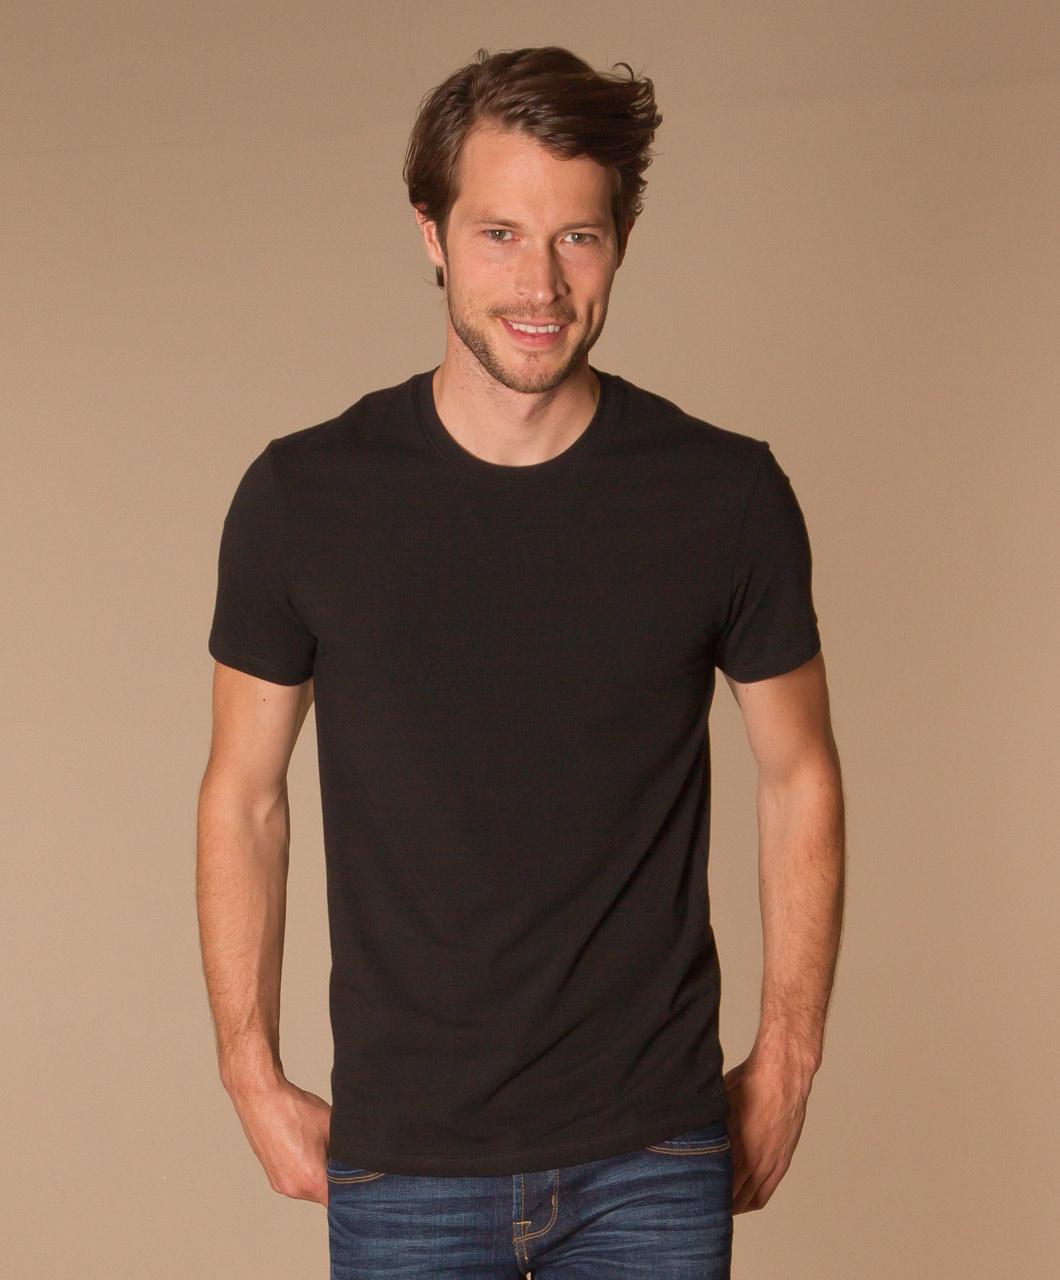 Black Man T Shirt